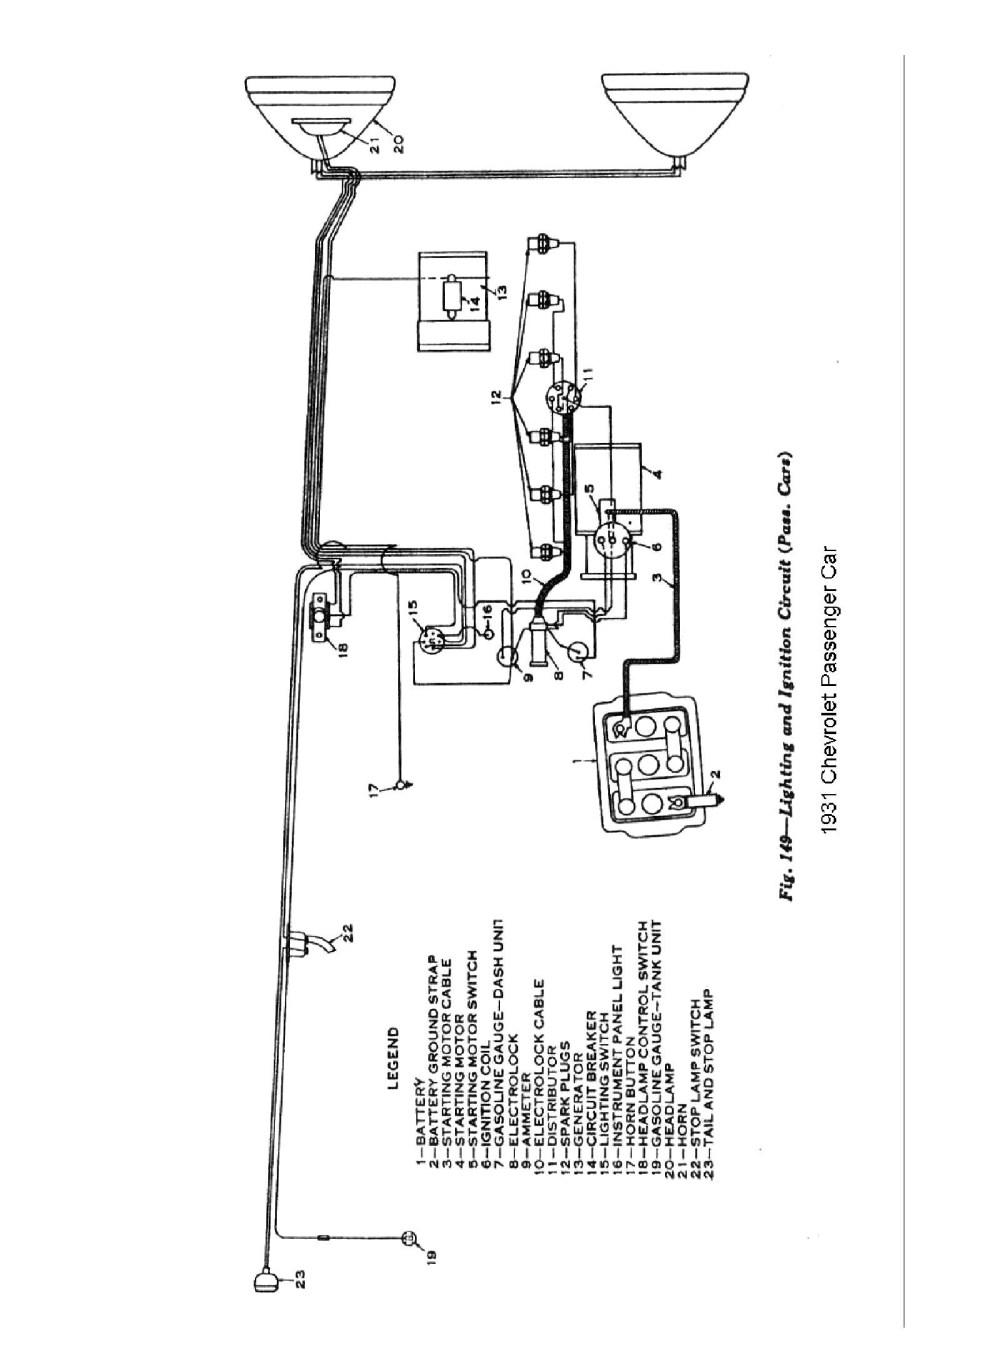 medium resolution of harley fuel gauge wiring diagram download lovely marine fuel sending unit wiring diagram gallery the